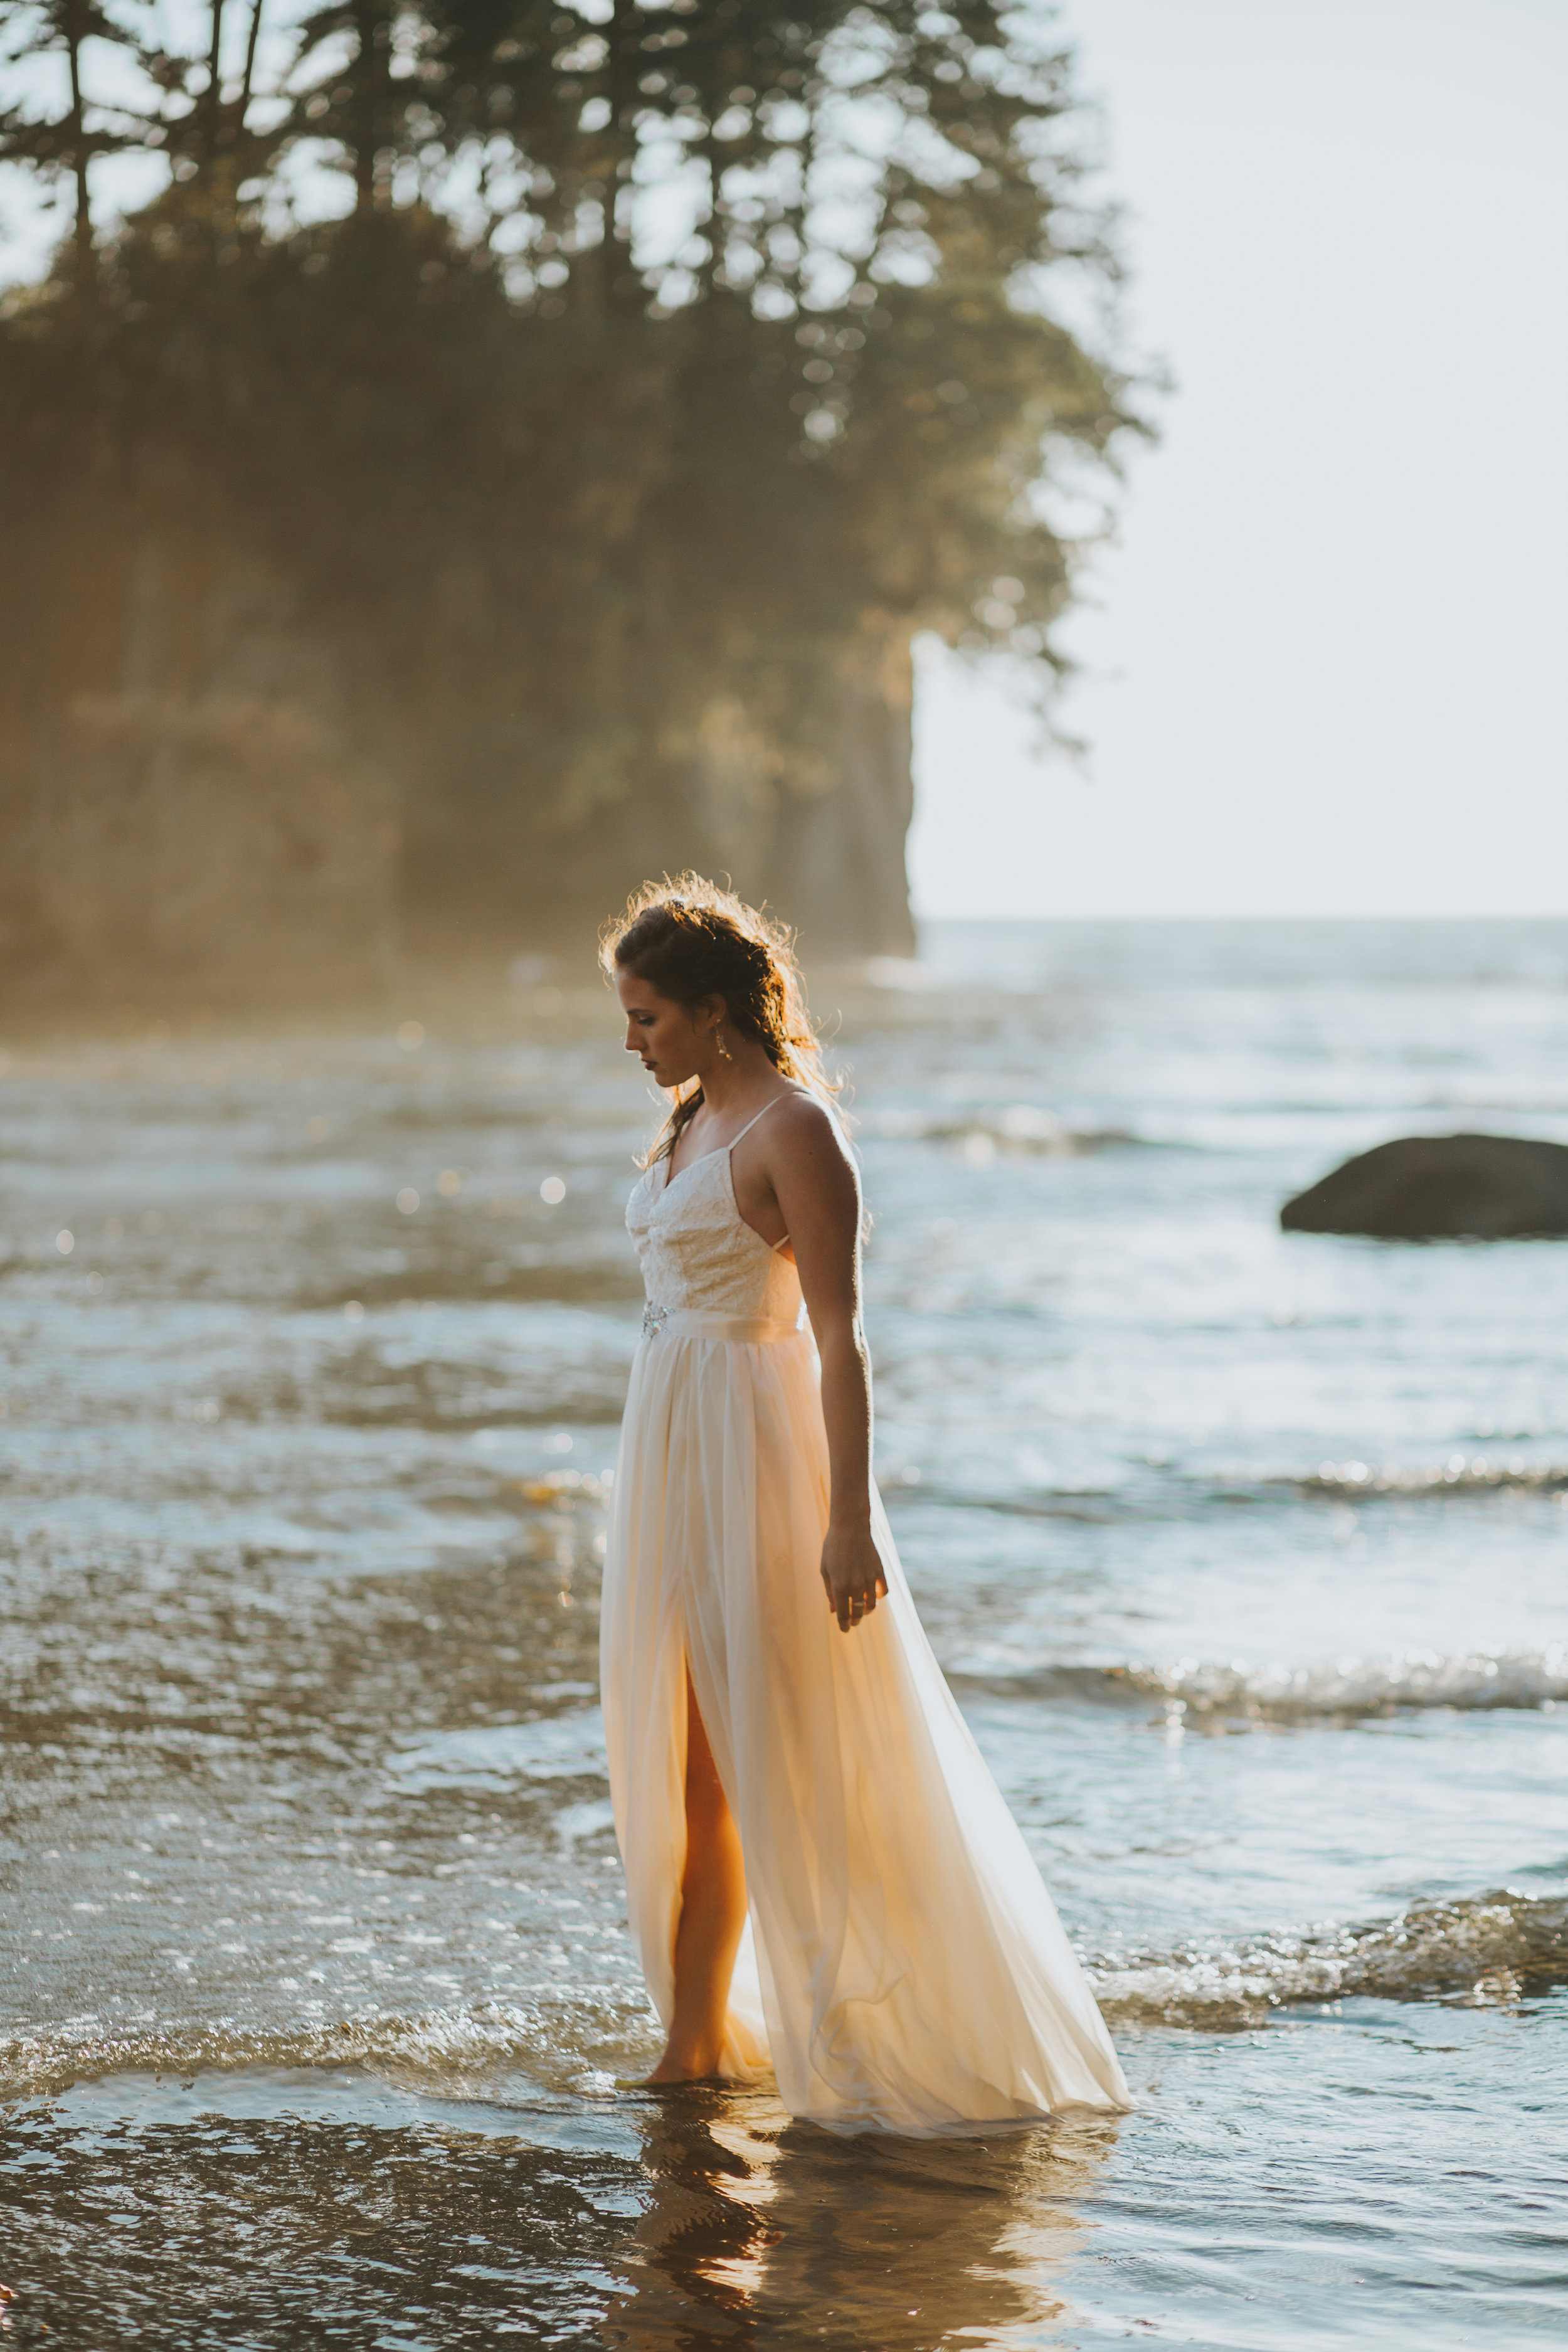 Port-Angeles-Salt-Creek-beach-wedding-bride-PNW-olympic-peninsula-photographer-Kayla-Dawn-Photography-outdoors-golden-hour-dancer-dress (41).jpg